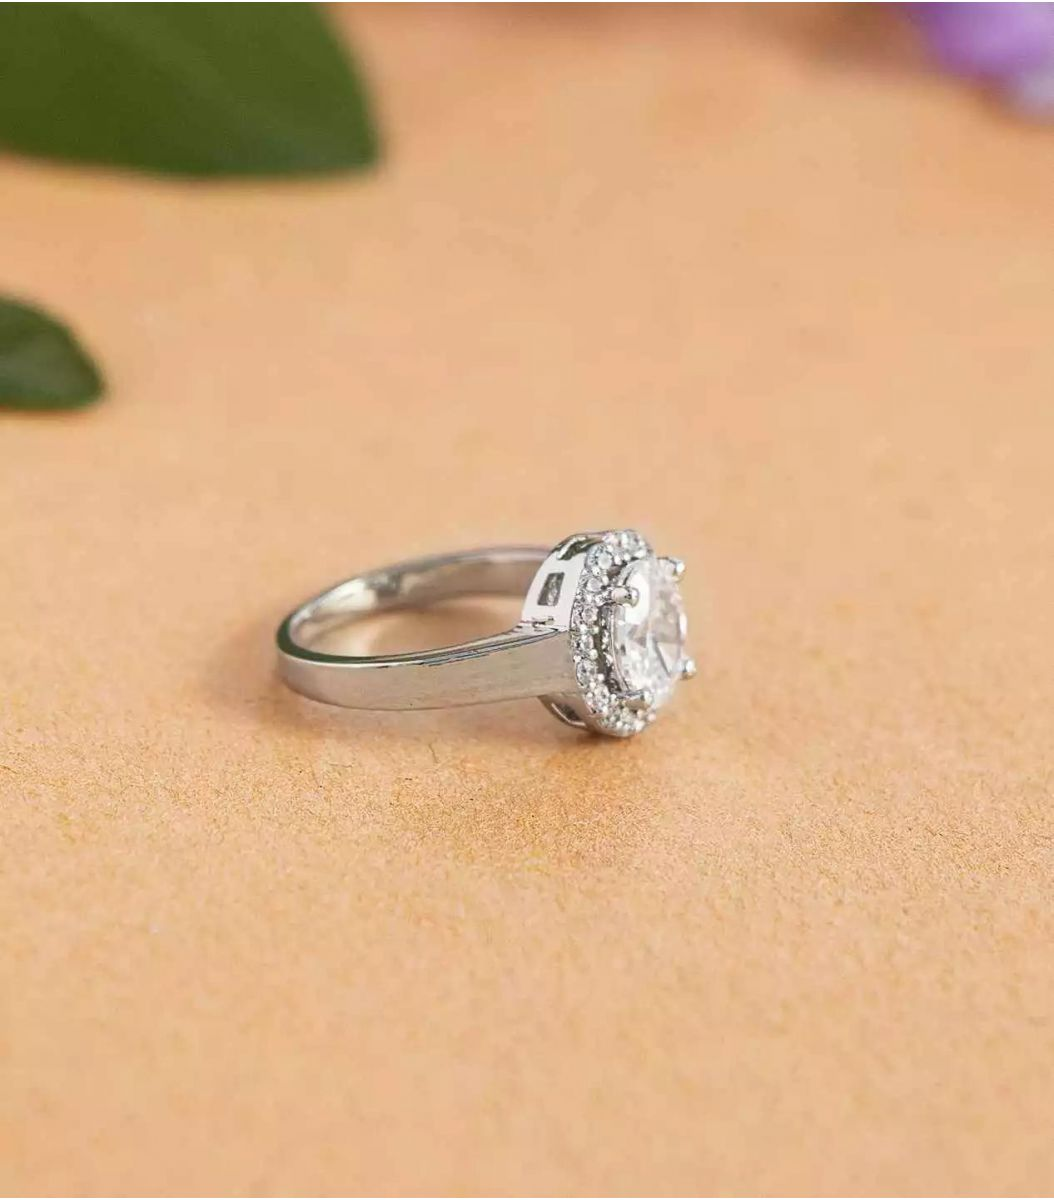 Silver Stone Finger Ring FJ1660244